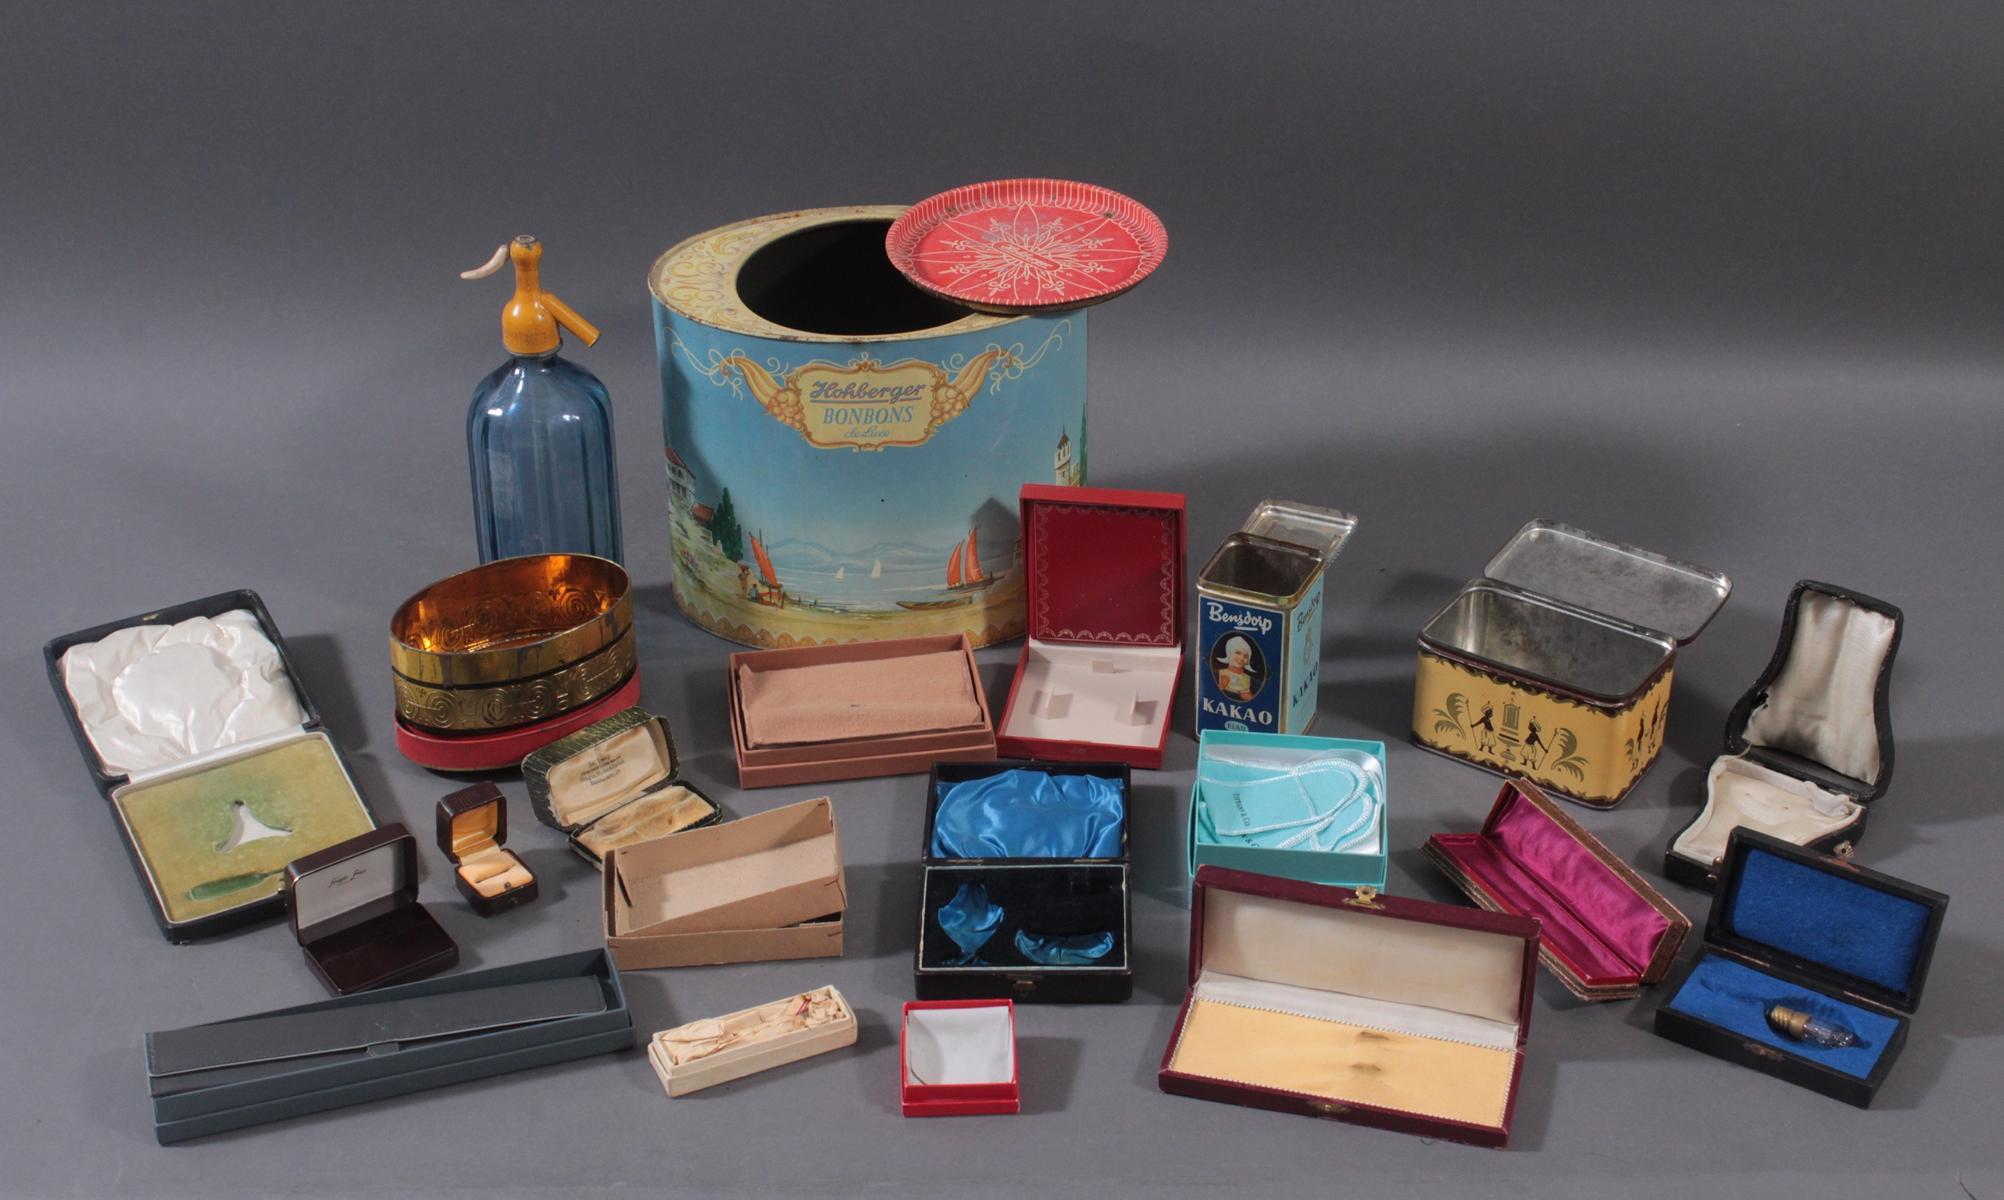 Konvolut Blechdosen, Sodaflasche und Schachteln